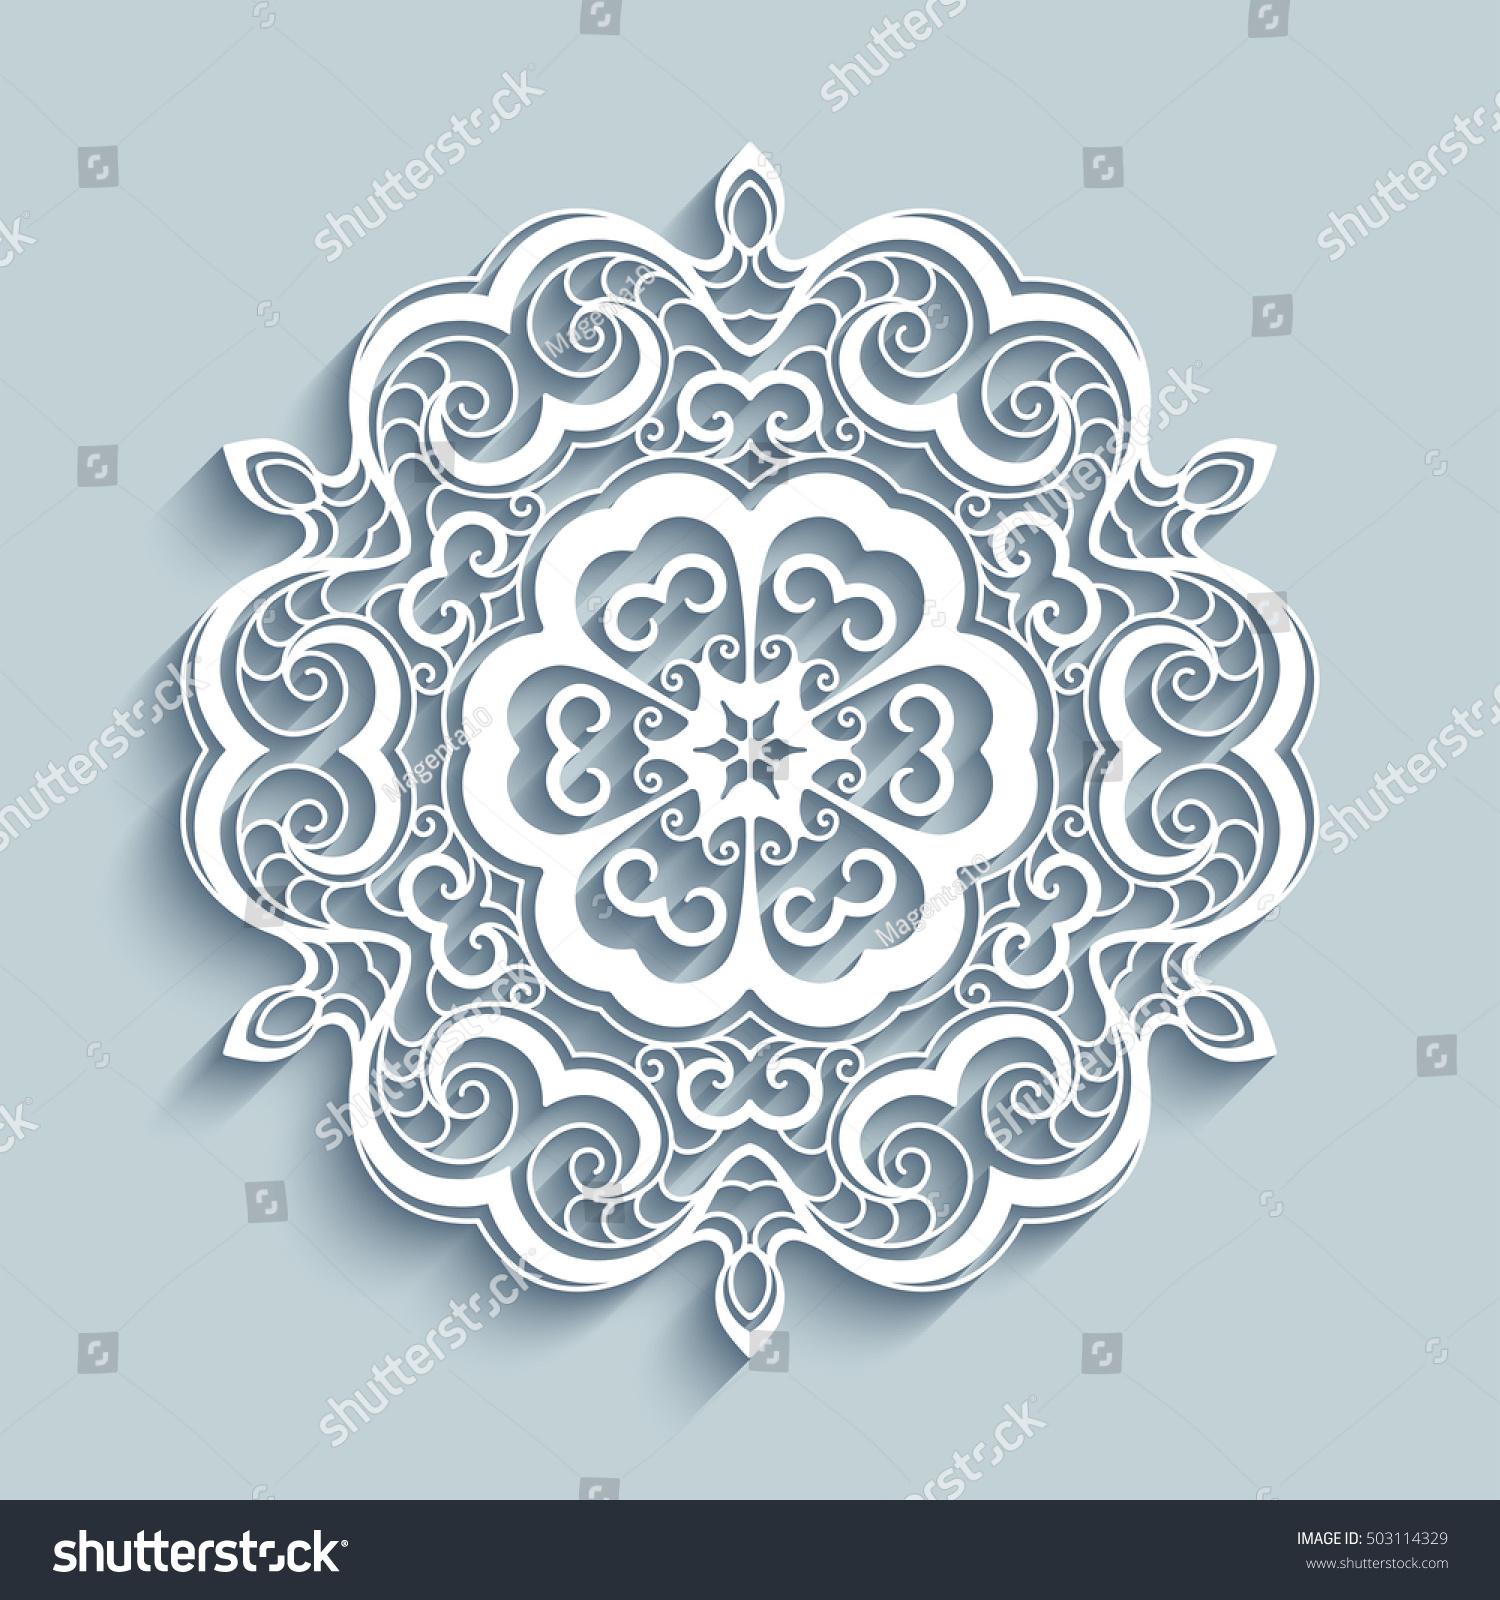 cutout paper lace doily decorative snowflake stock vector